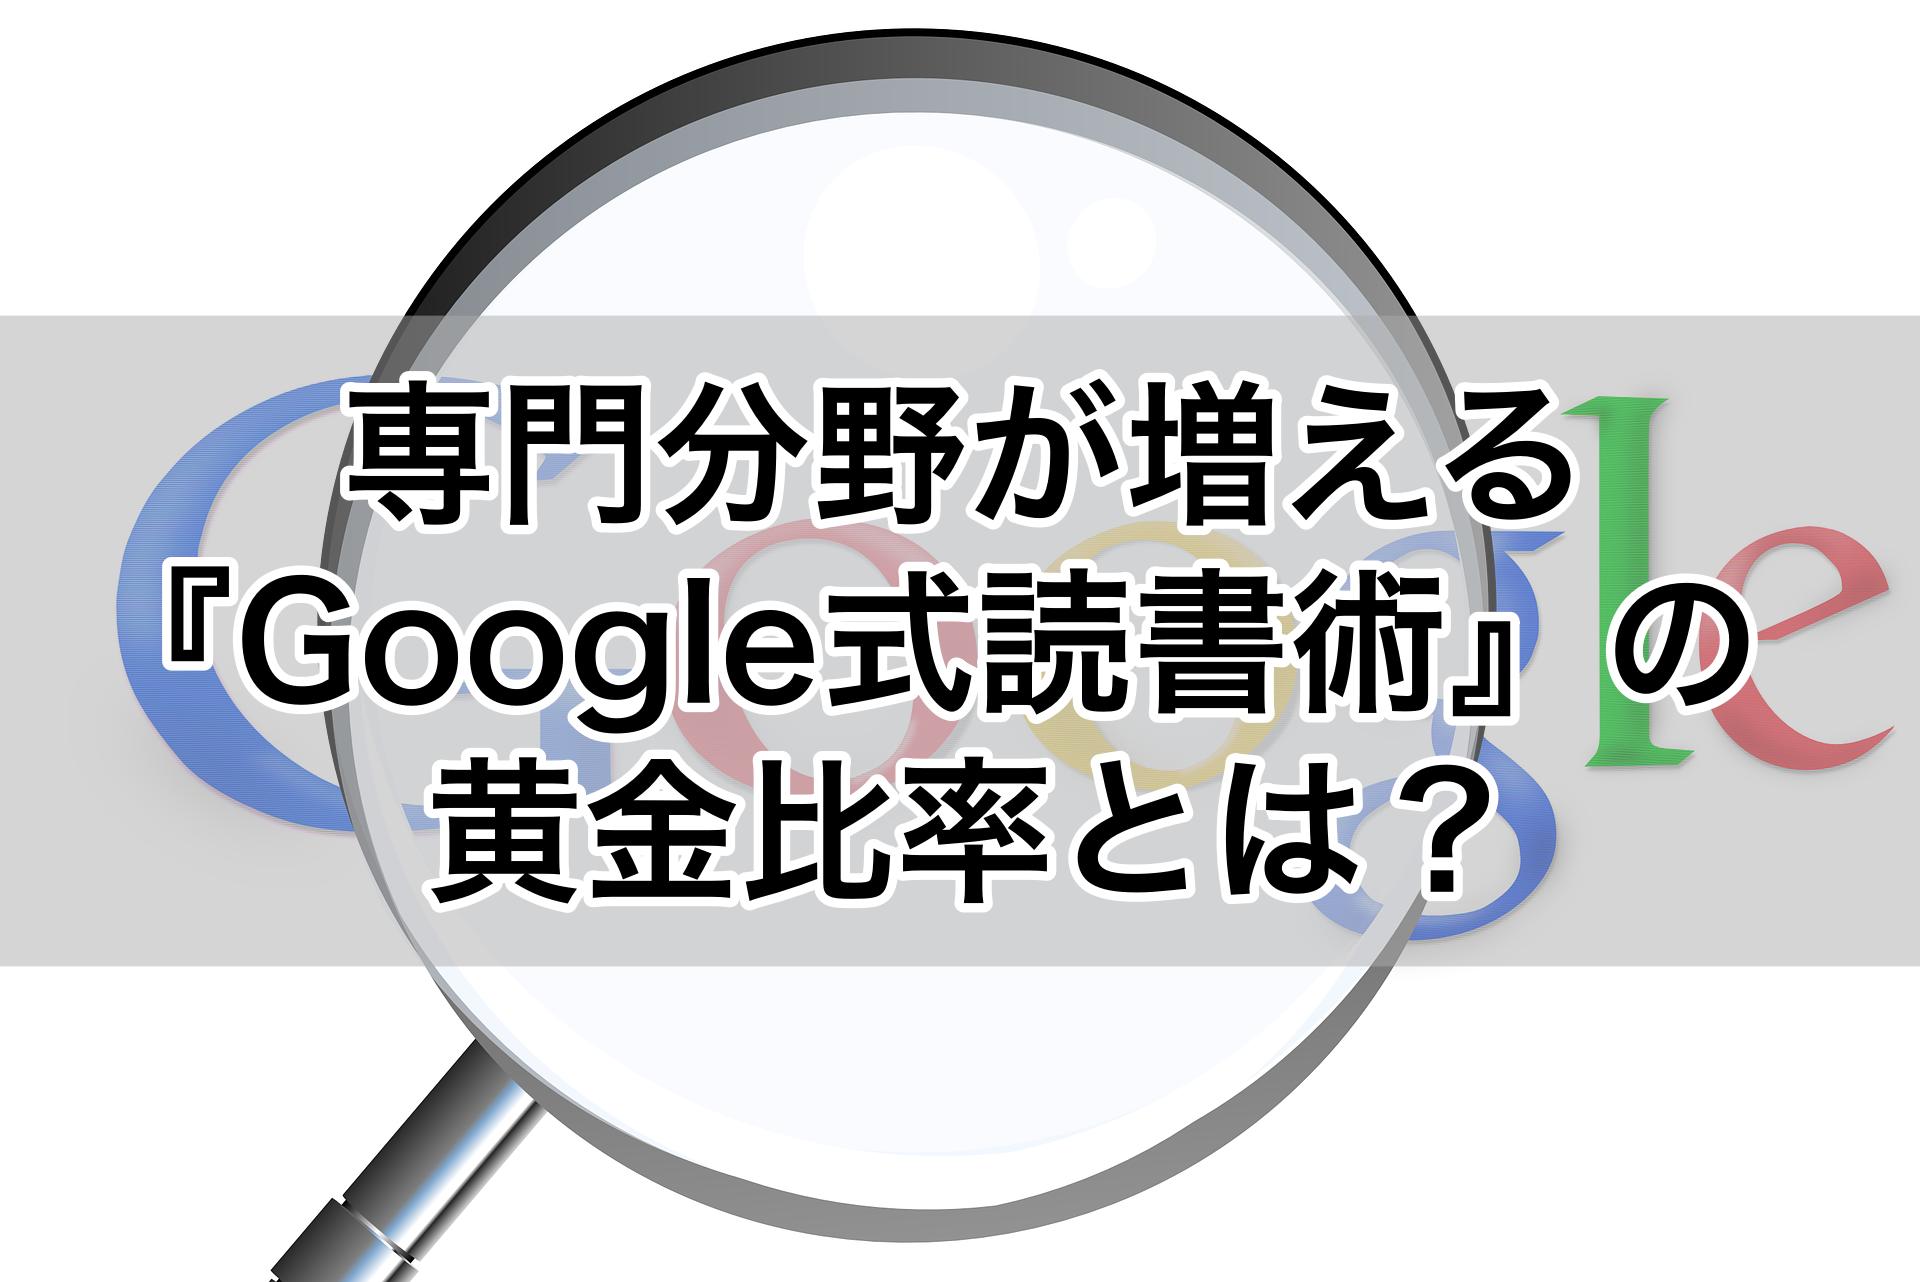 Google 読書術